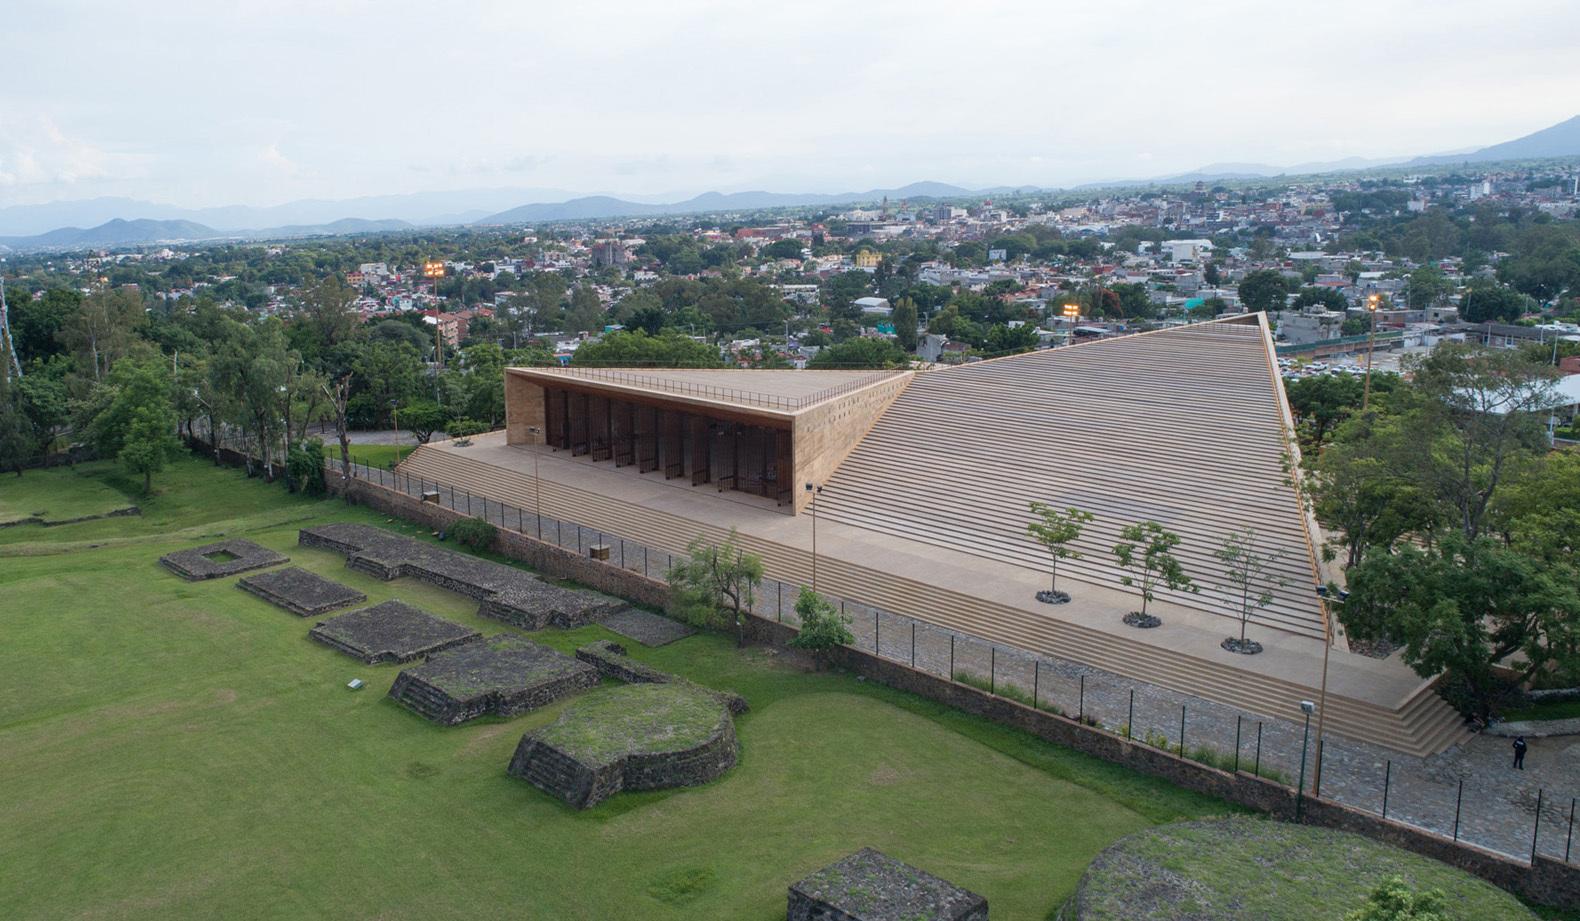 Teopanzolco Cultural Center / Isaac Broid + PRODUCTORA, © Jaime Navarro